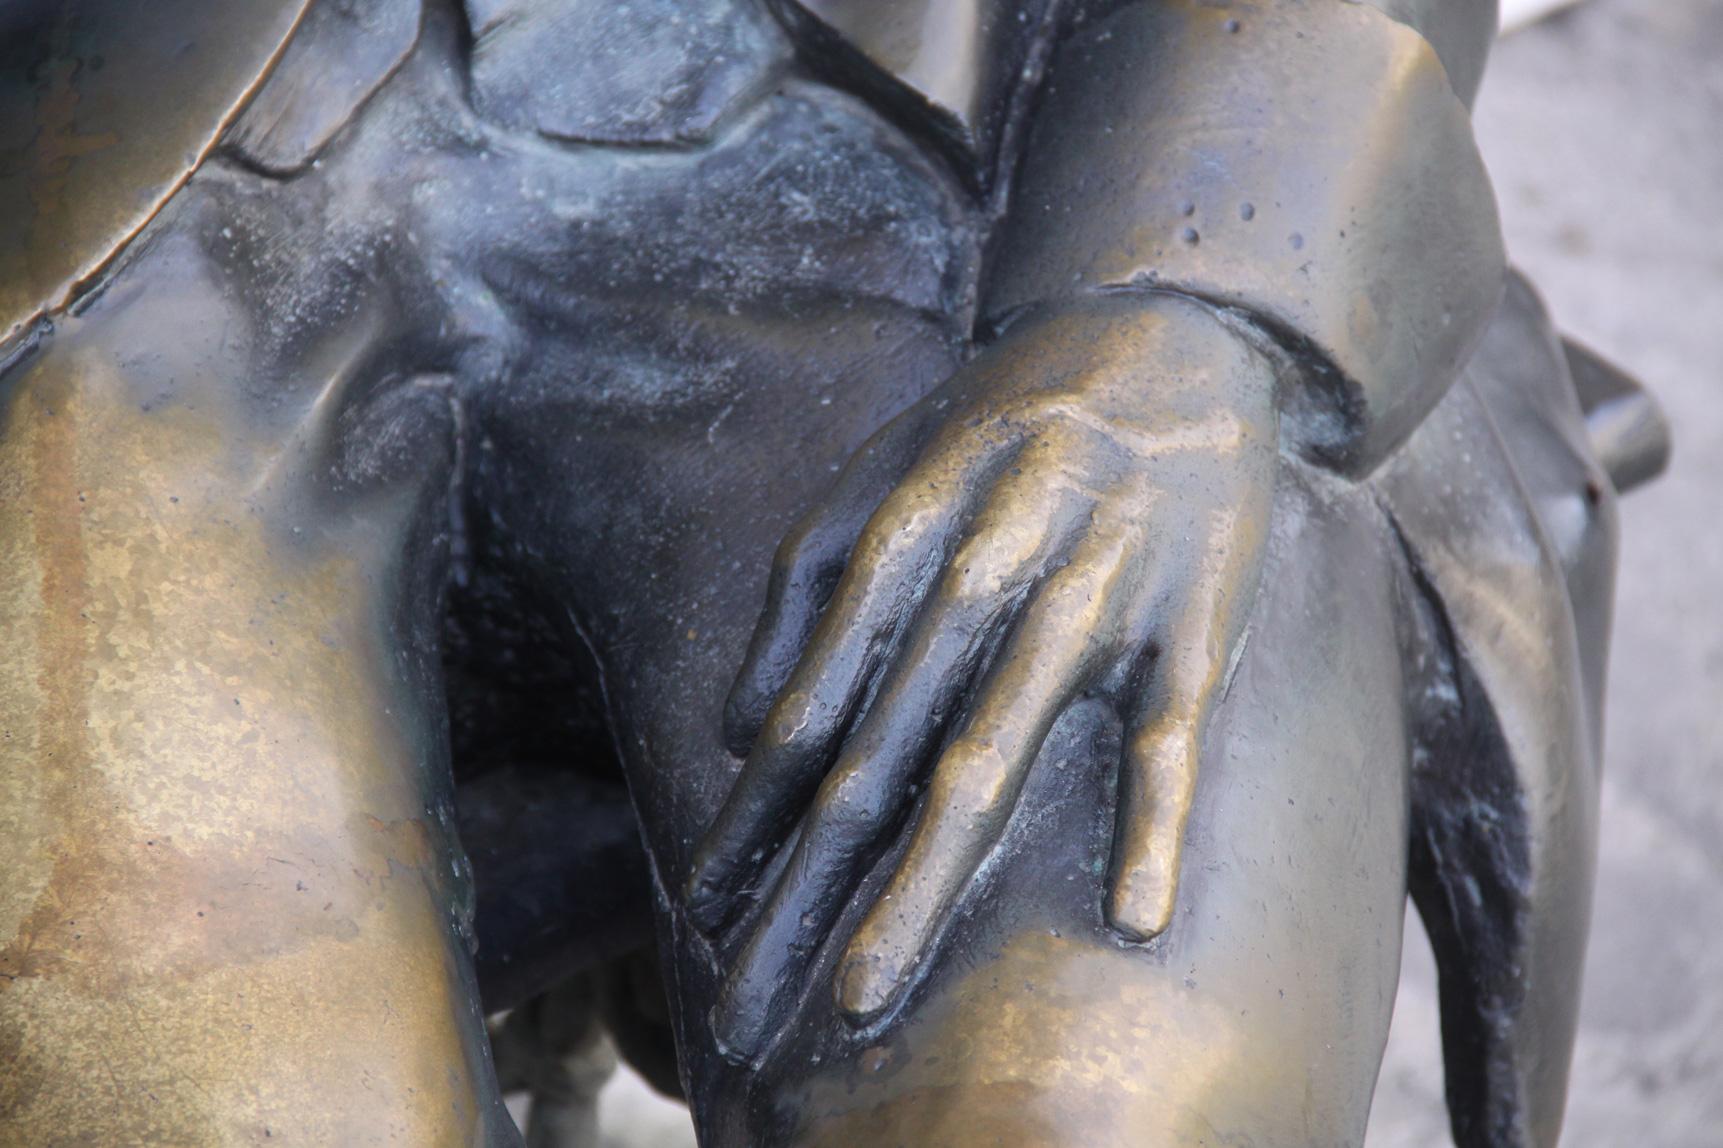 Chopin's hand